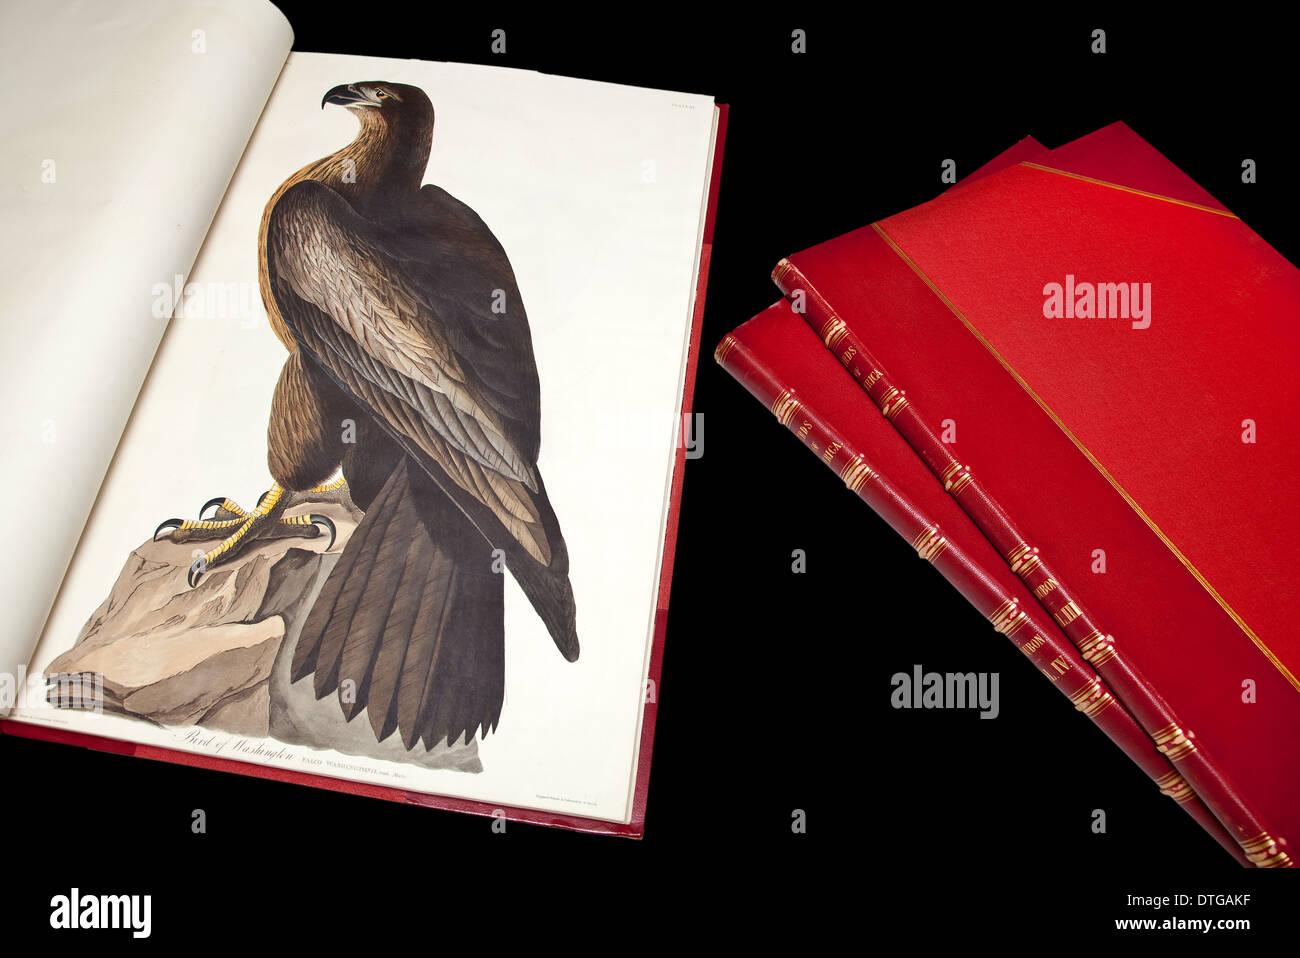 Bound copy of The Birds of America by John James Audubon. - Stock Image